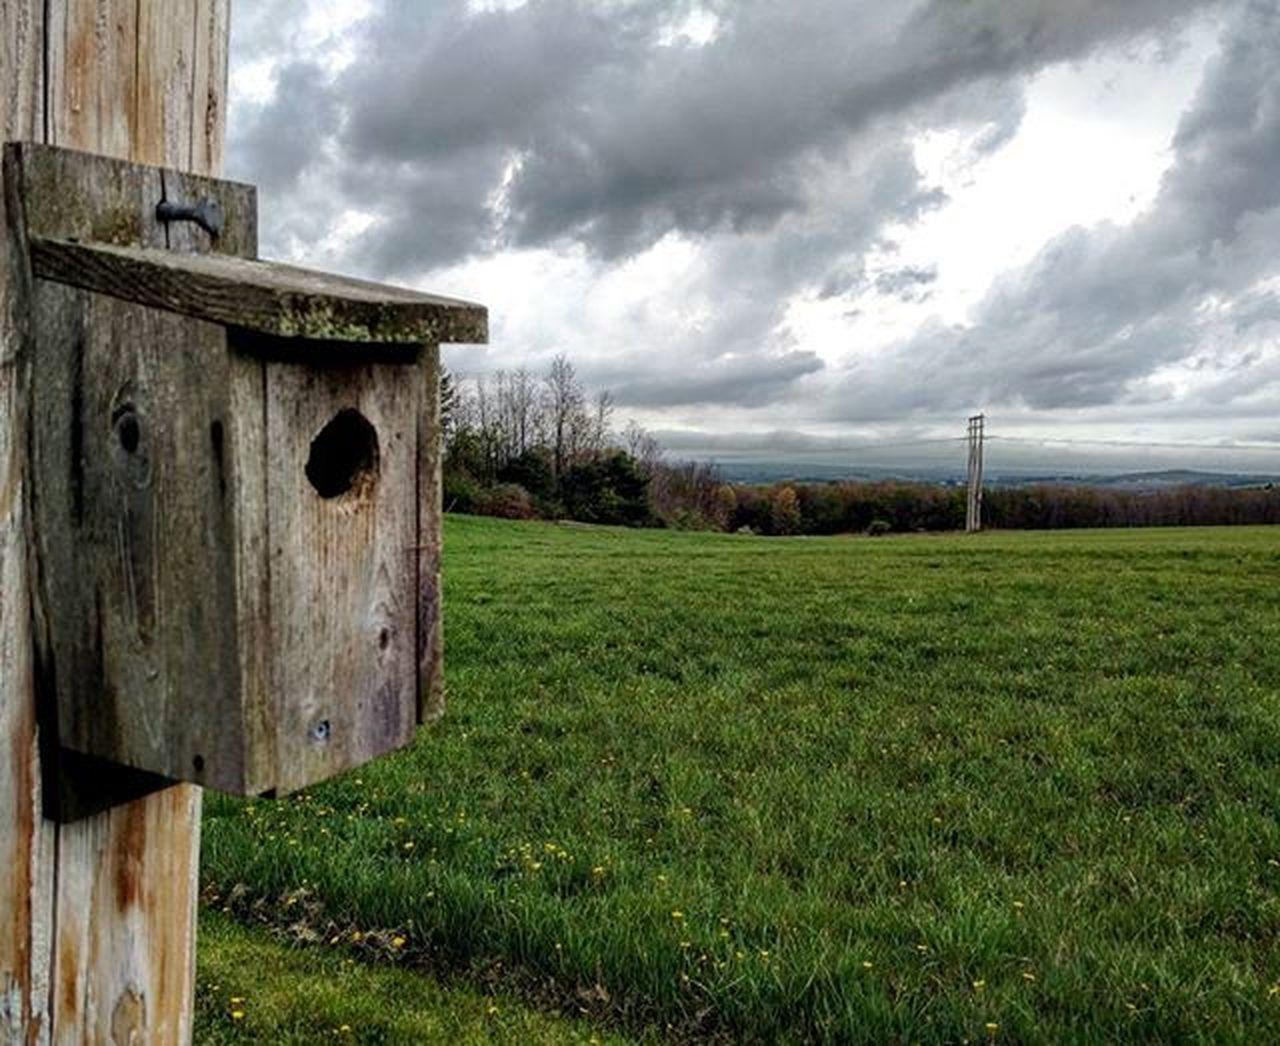 Birdhouse🐦🏠⛅ . . . . . . Nature Outdoors Birdhouse Bird Cloudy Moodygram Illgrammers DOPE GetOutThere Adventure Scenicpa Centralpascenery WesternPA Cool Teampawild Pennsylvania